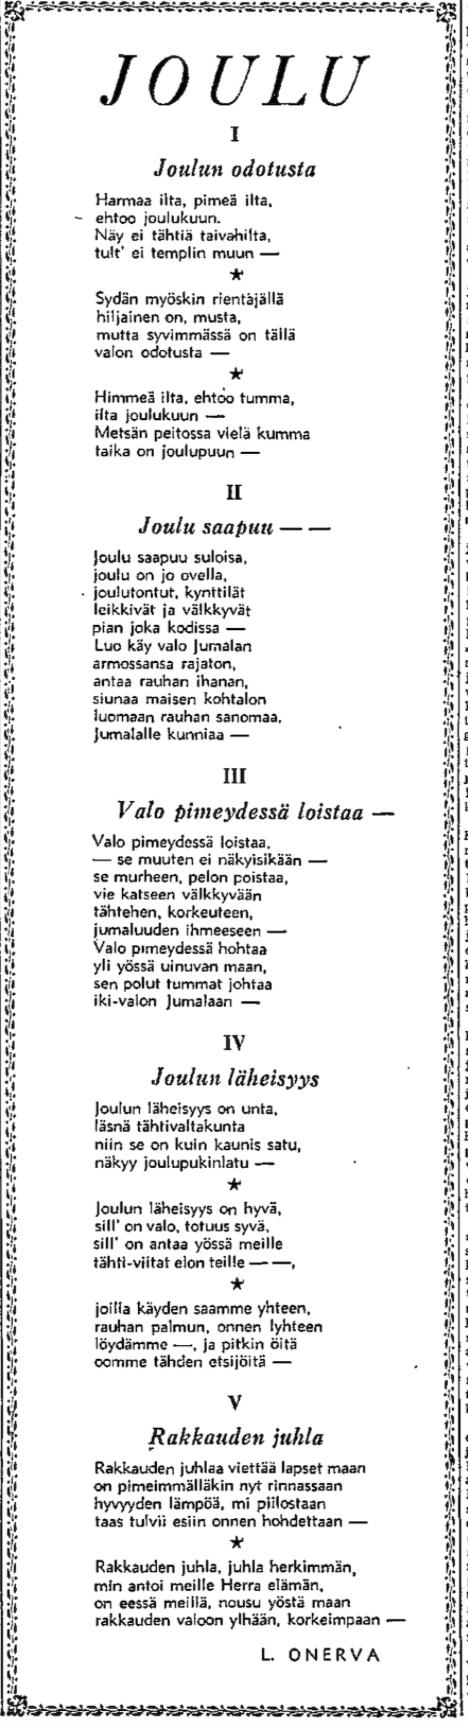 L. Onerva: Joulu - HS 24.12.1950